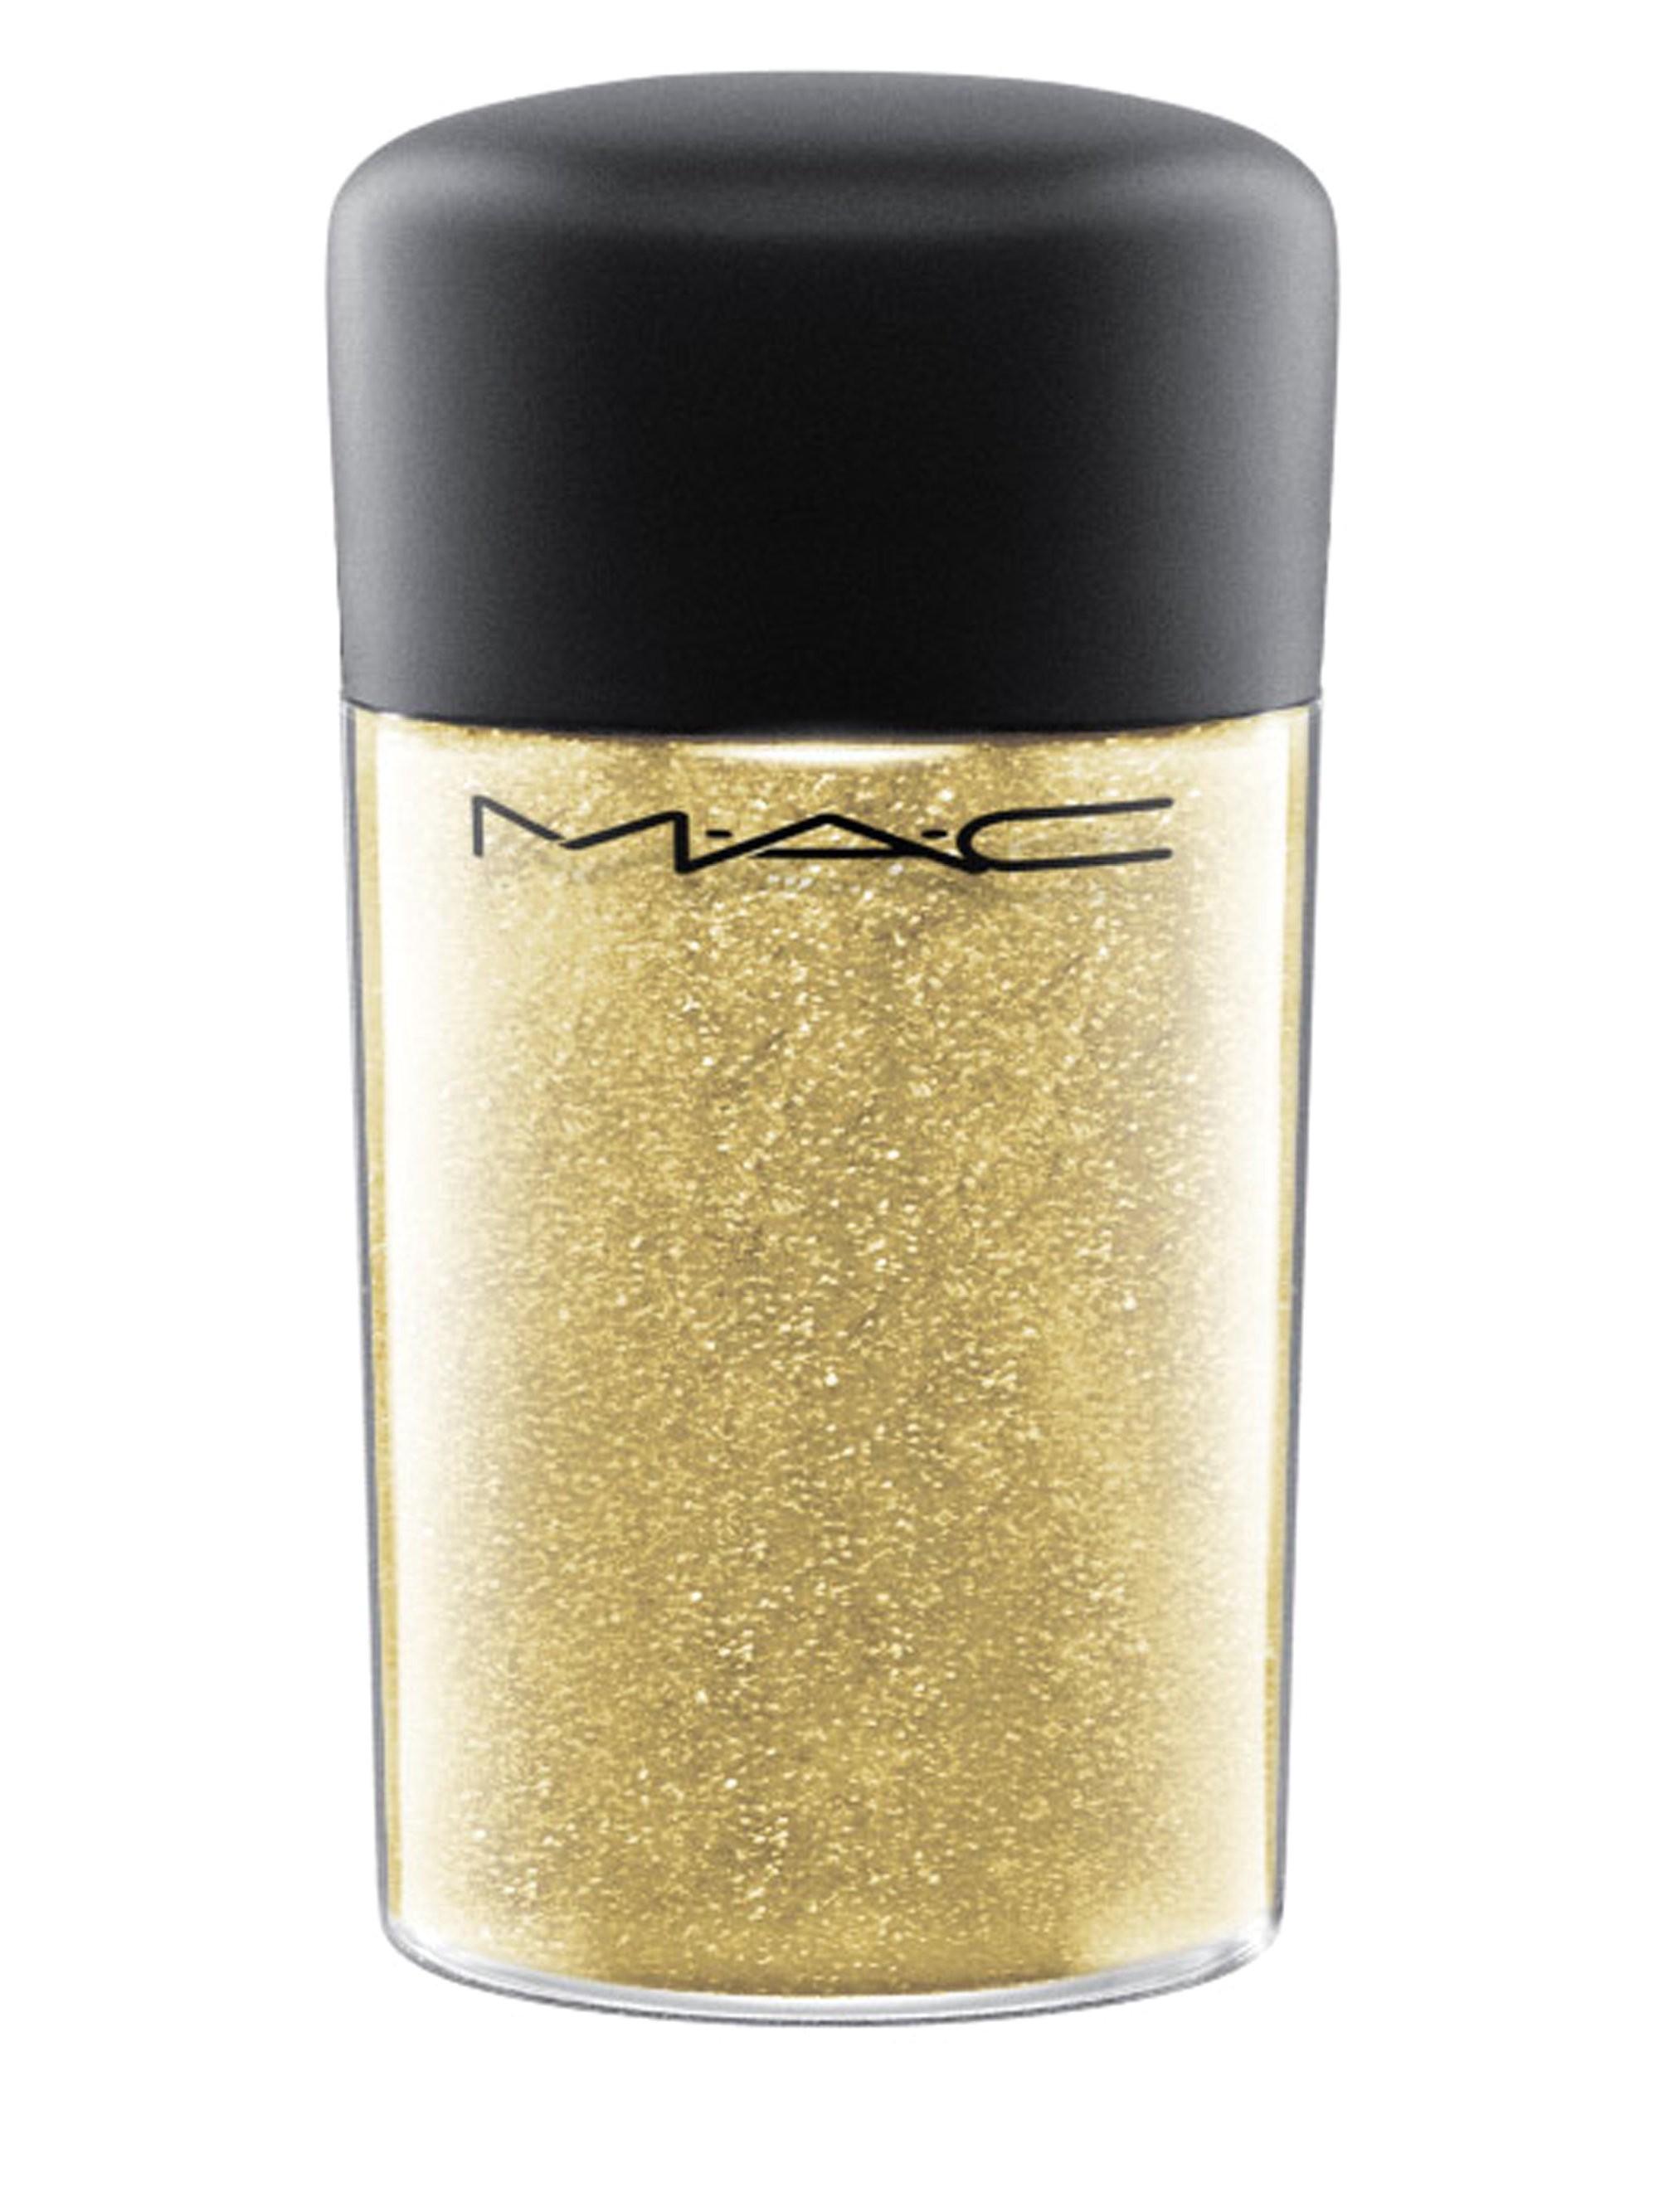 Mac Cosmetics Galactic Glitter & Gloss Yellow Gold